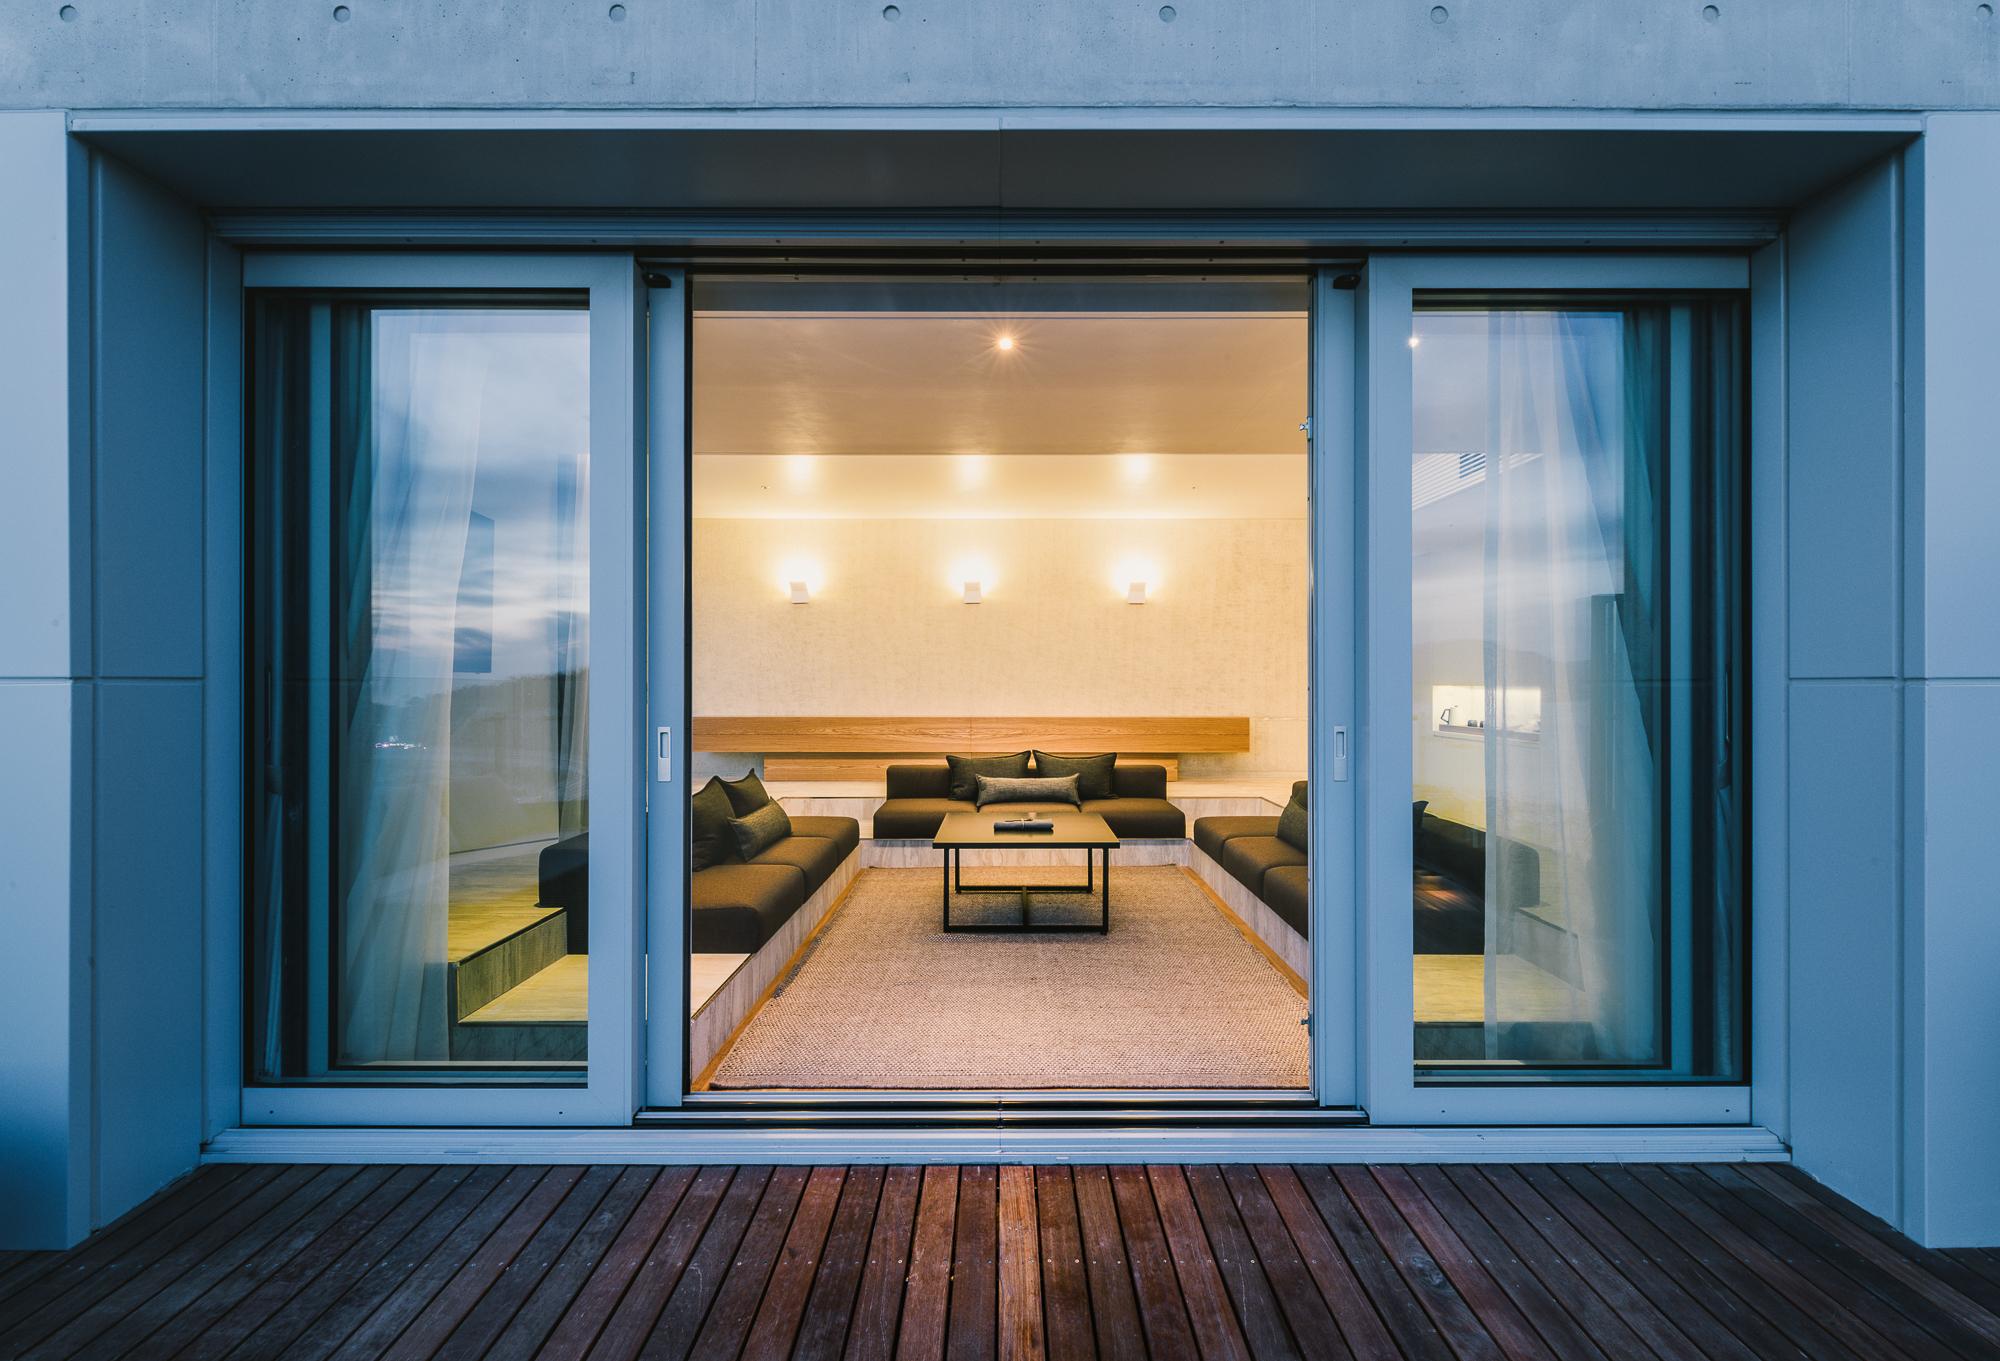 nest hotel, Incheon, 대림건설